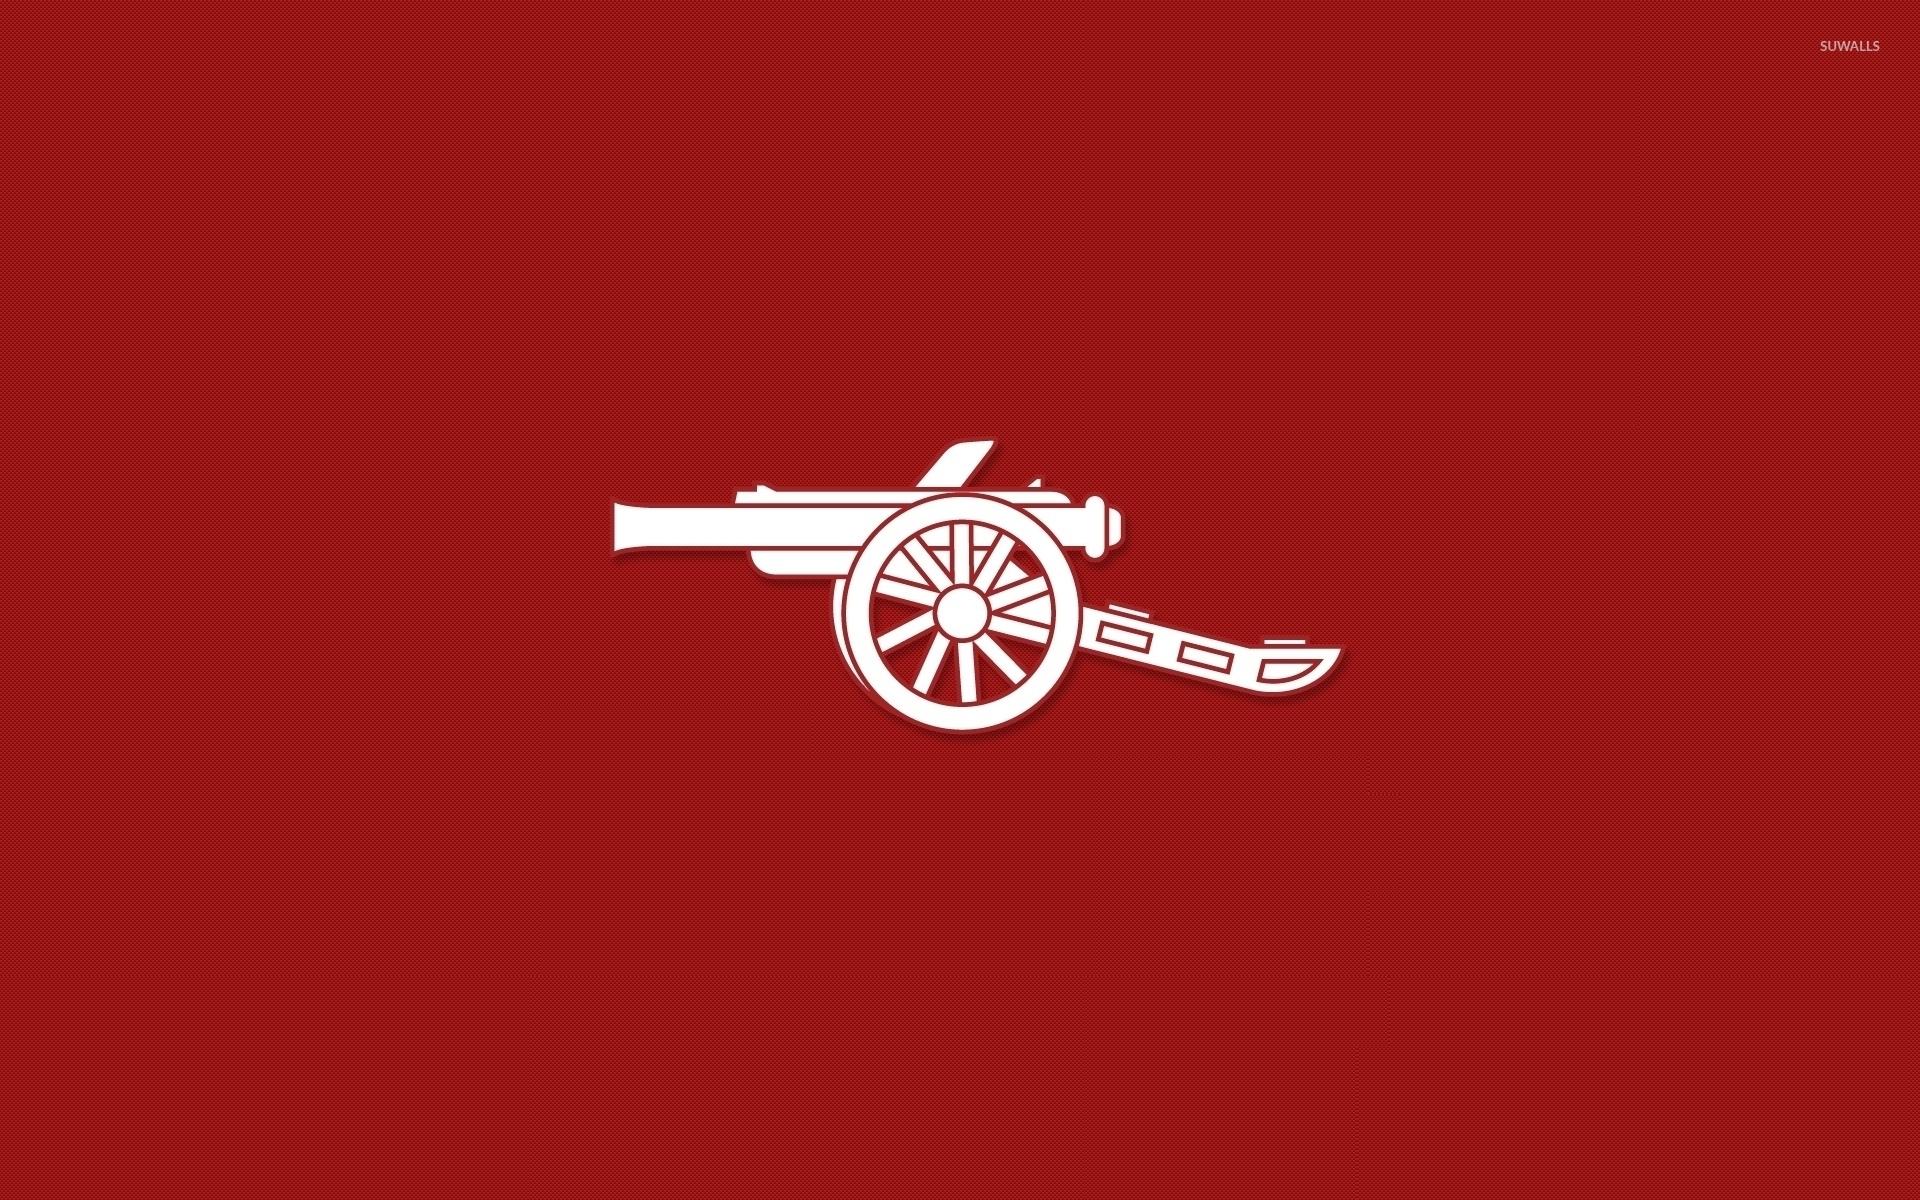 Arsenal F.C. wallpaper - Sport wallpapers - #32422